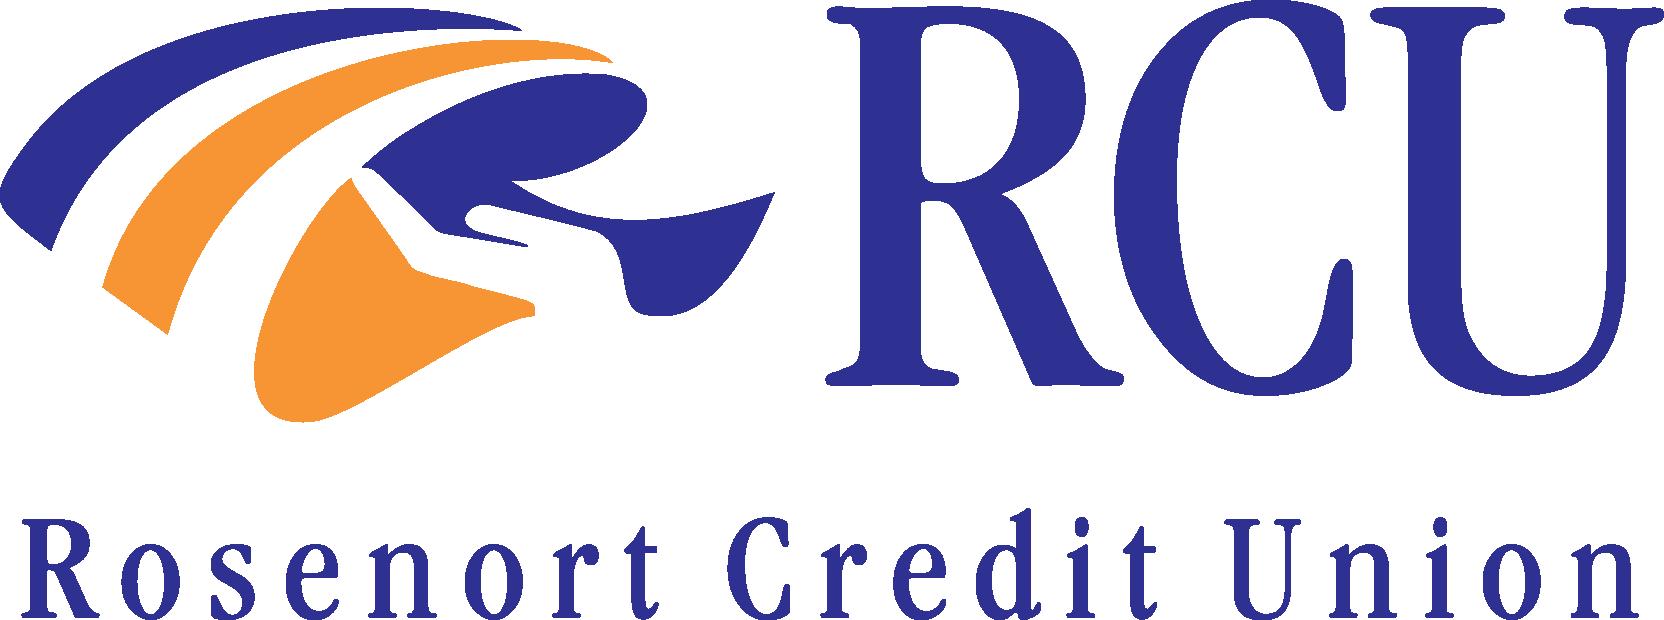 Rosenort Credit Union